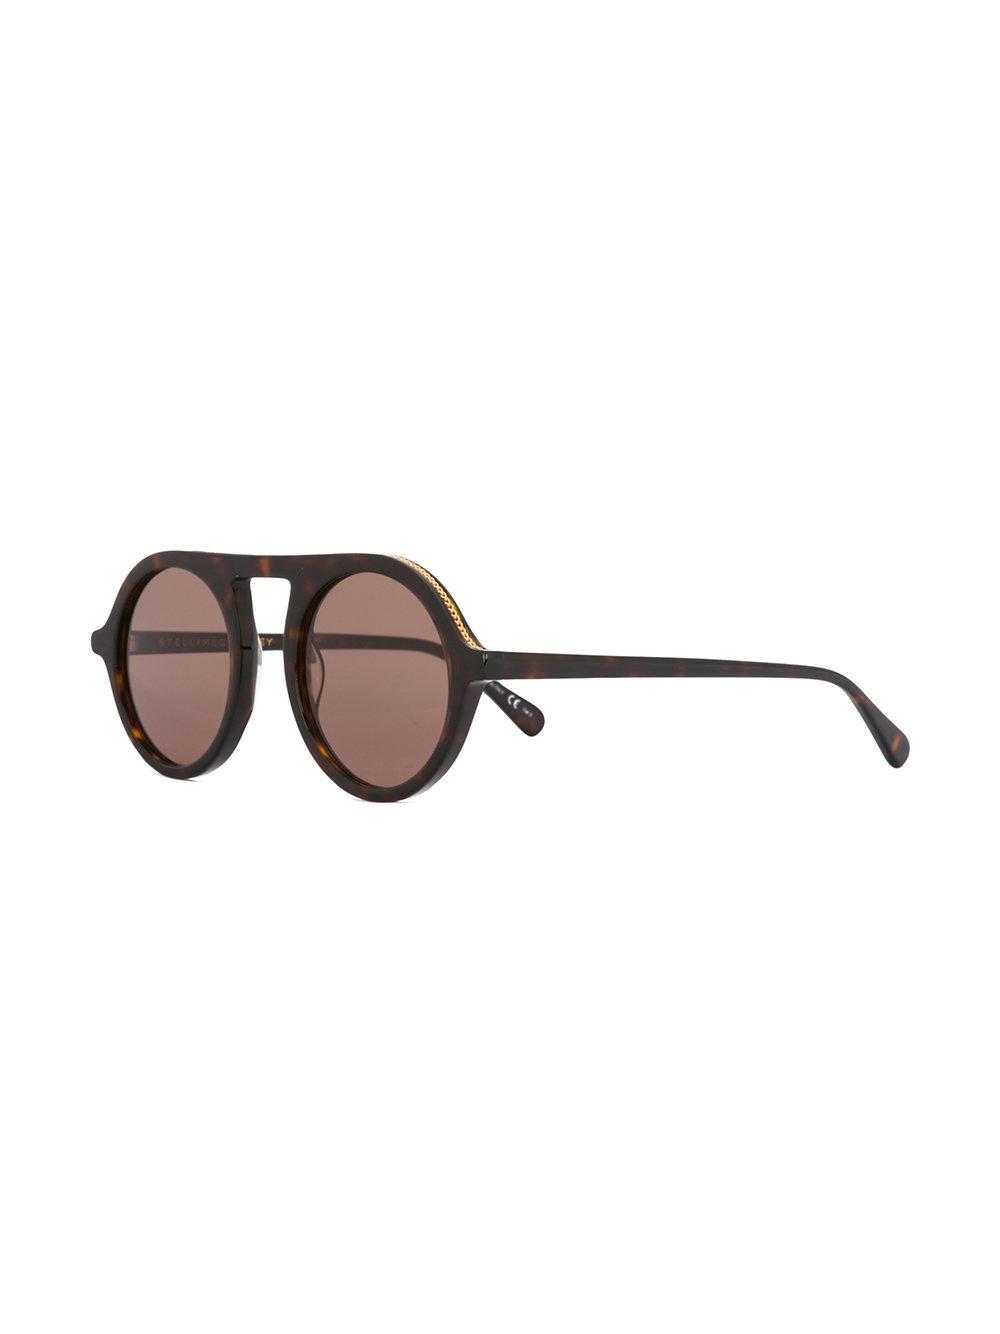 d2a9c2eb9f Stella McCartney - Brown Retro Round Tortoiseshell Sunglasses - Lyst. View  fullscreen